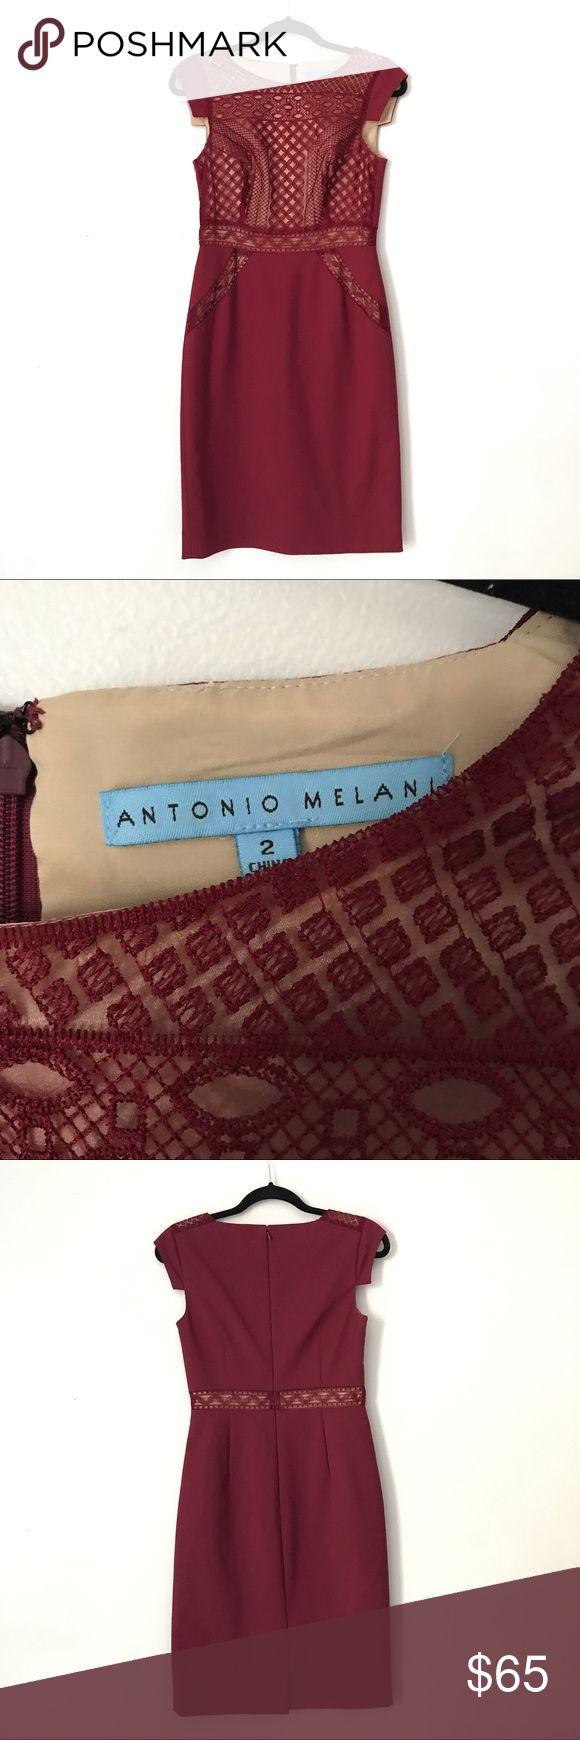 Antonio Melani Wine Lace Cap Sleeve Dress Beautiful wine red colored Lace cap sleeve dress from Antonio Melani. Size 2. Great pre worn condition! No trades or try ons. ANTONIO MELANI Dresses